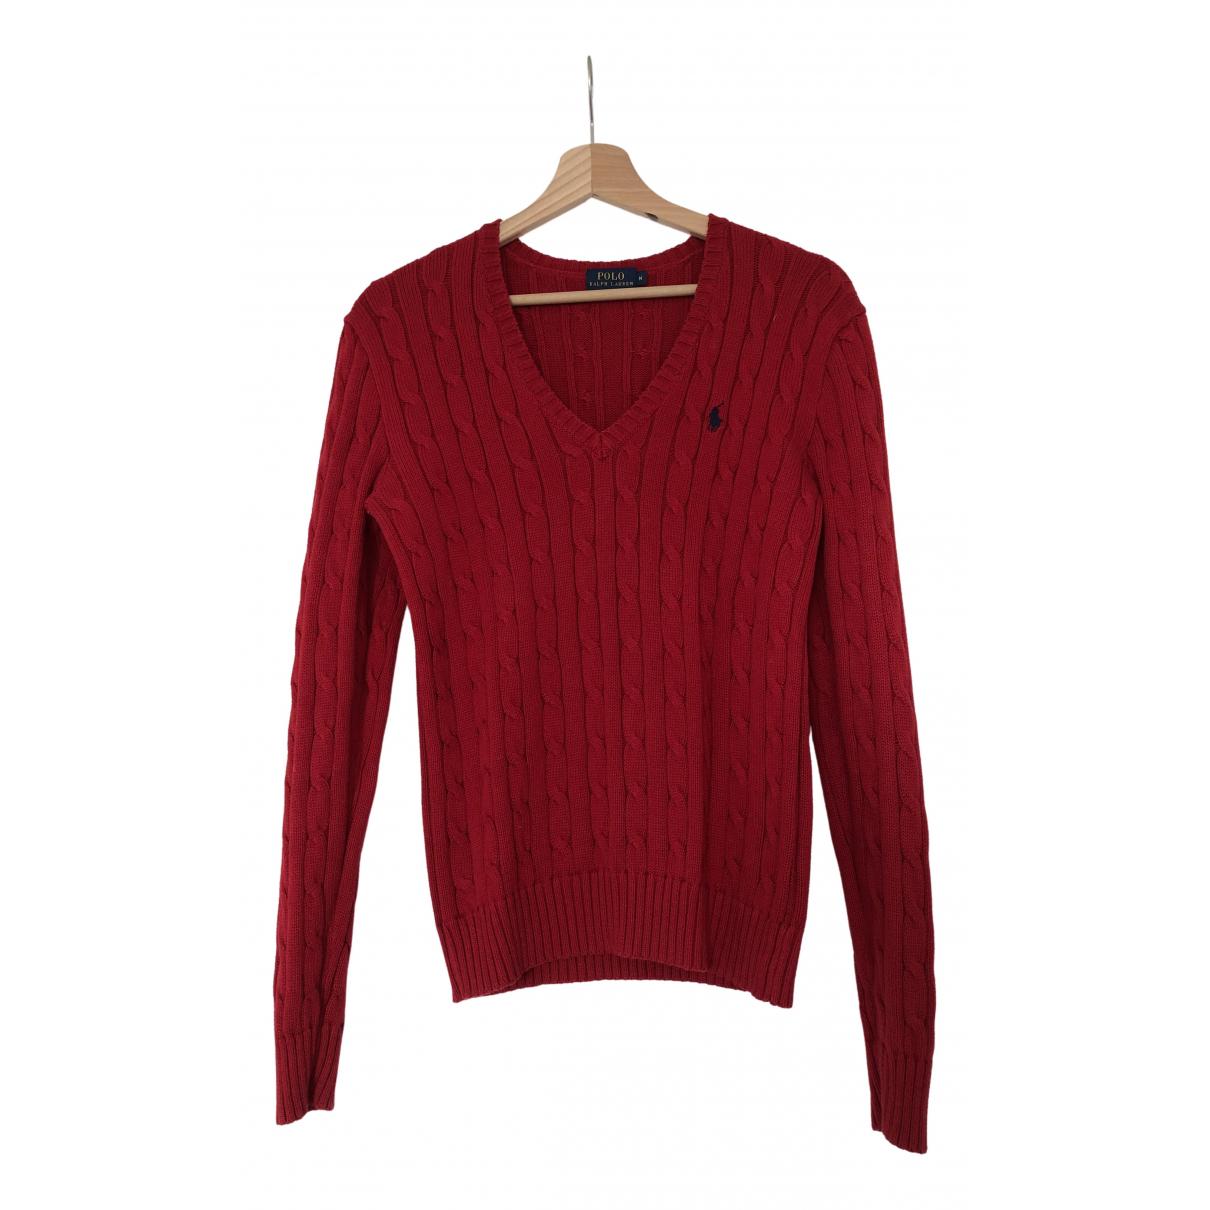 Polo Ralph Lauren \N Red Cotton Knitwear for Women M International